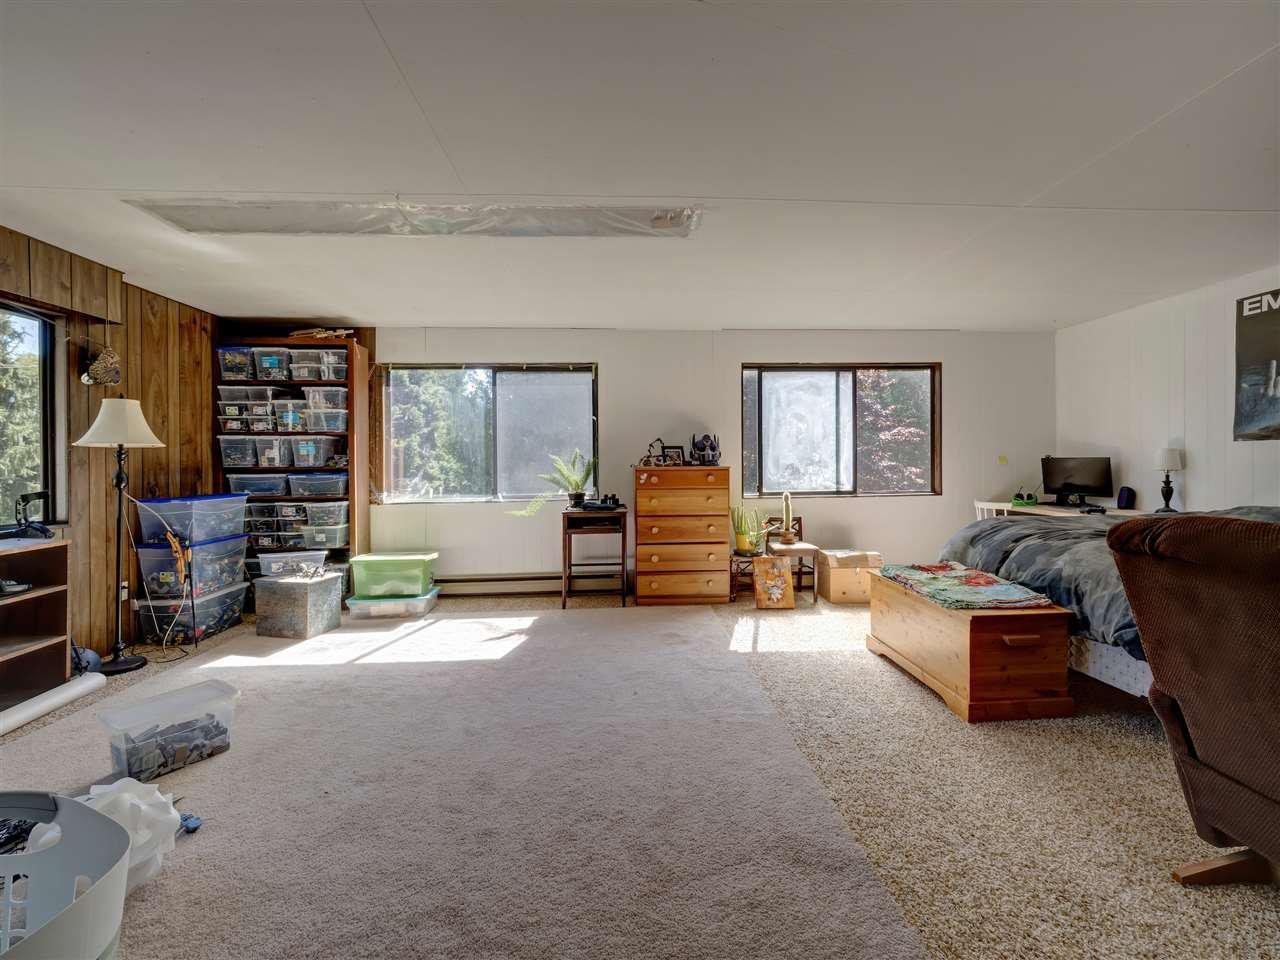 Photo 15: Photos: 5761 MCLAUGHAN Road in Sechelt: Sechelt District House for sale (Sunshine Coast)  : MLS®# R2479077